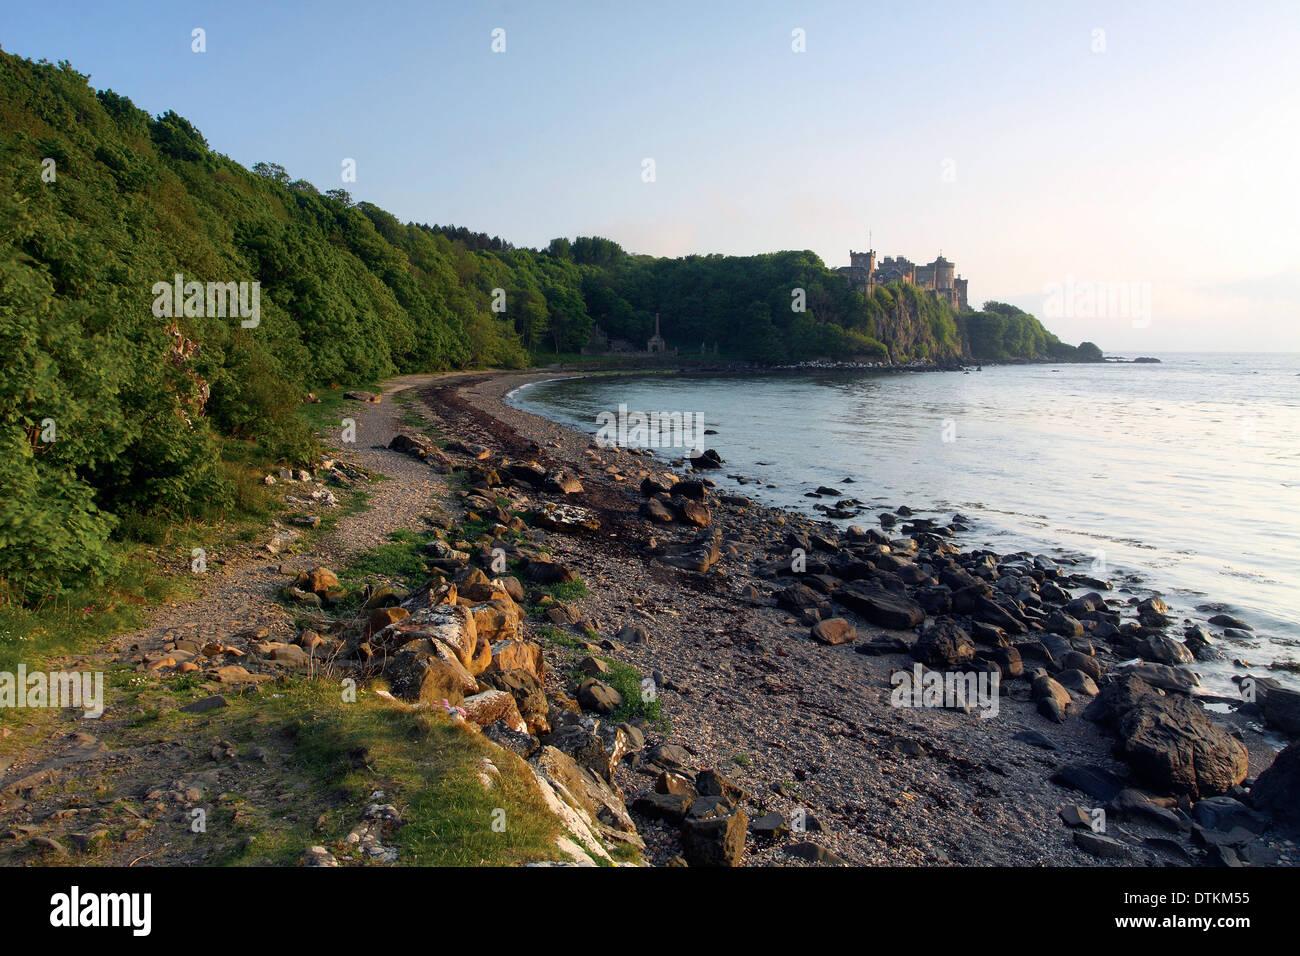 Culzean Castle at dusk from Culzean Bay on the Ayrshire Coastal Path, Ayrshire Stock Photo